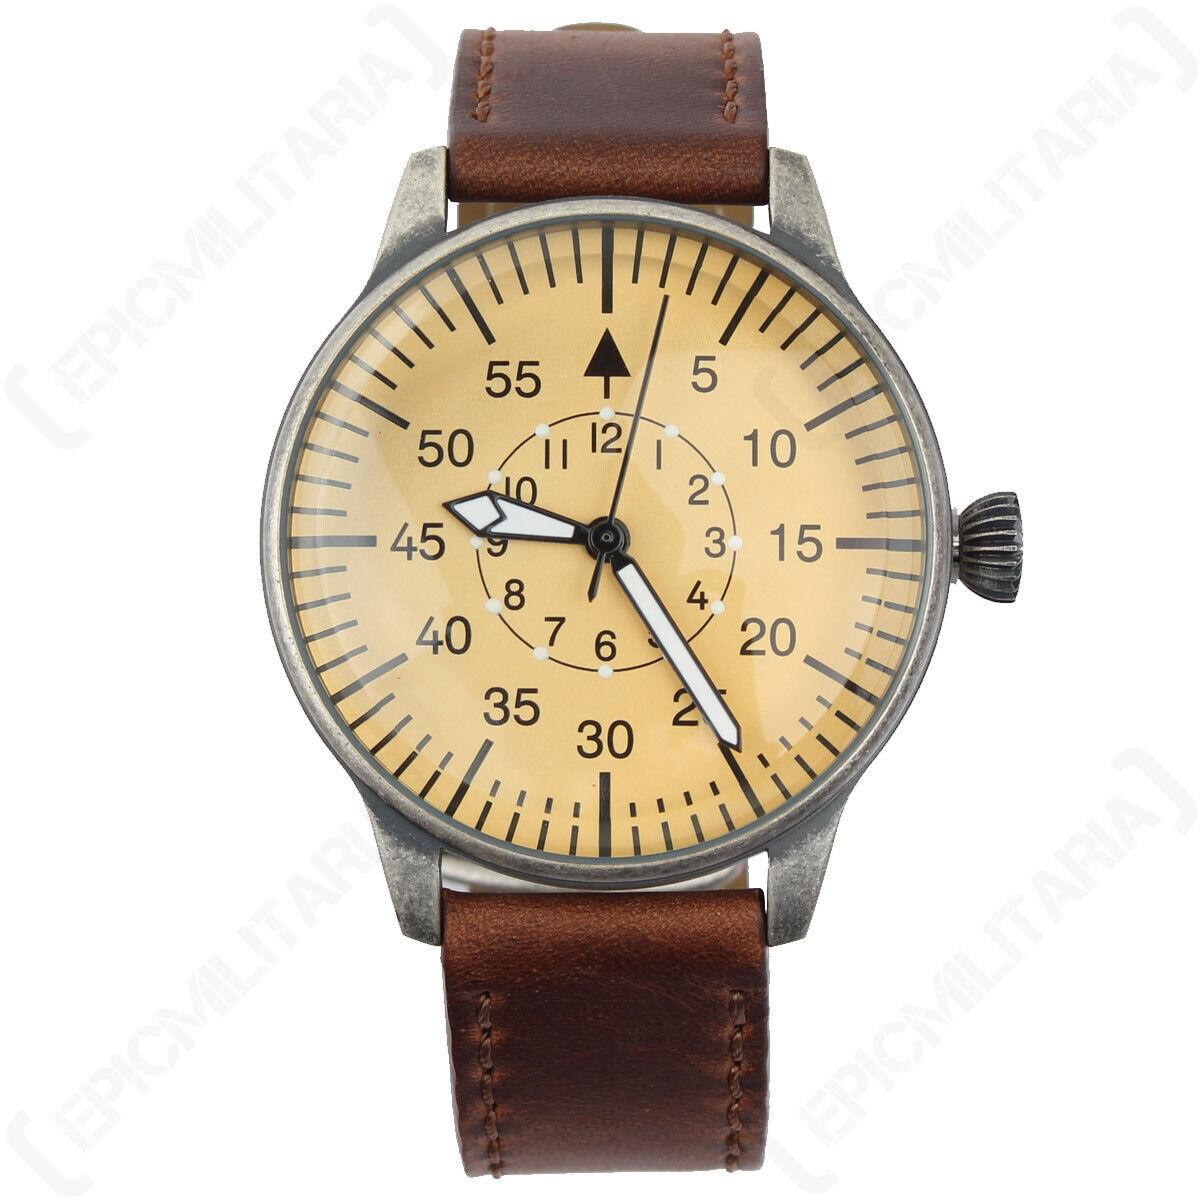 Luftwaffe Pilot Watch  Vintage WW2 German Military Wristwatch Leather Strap